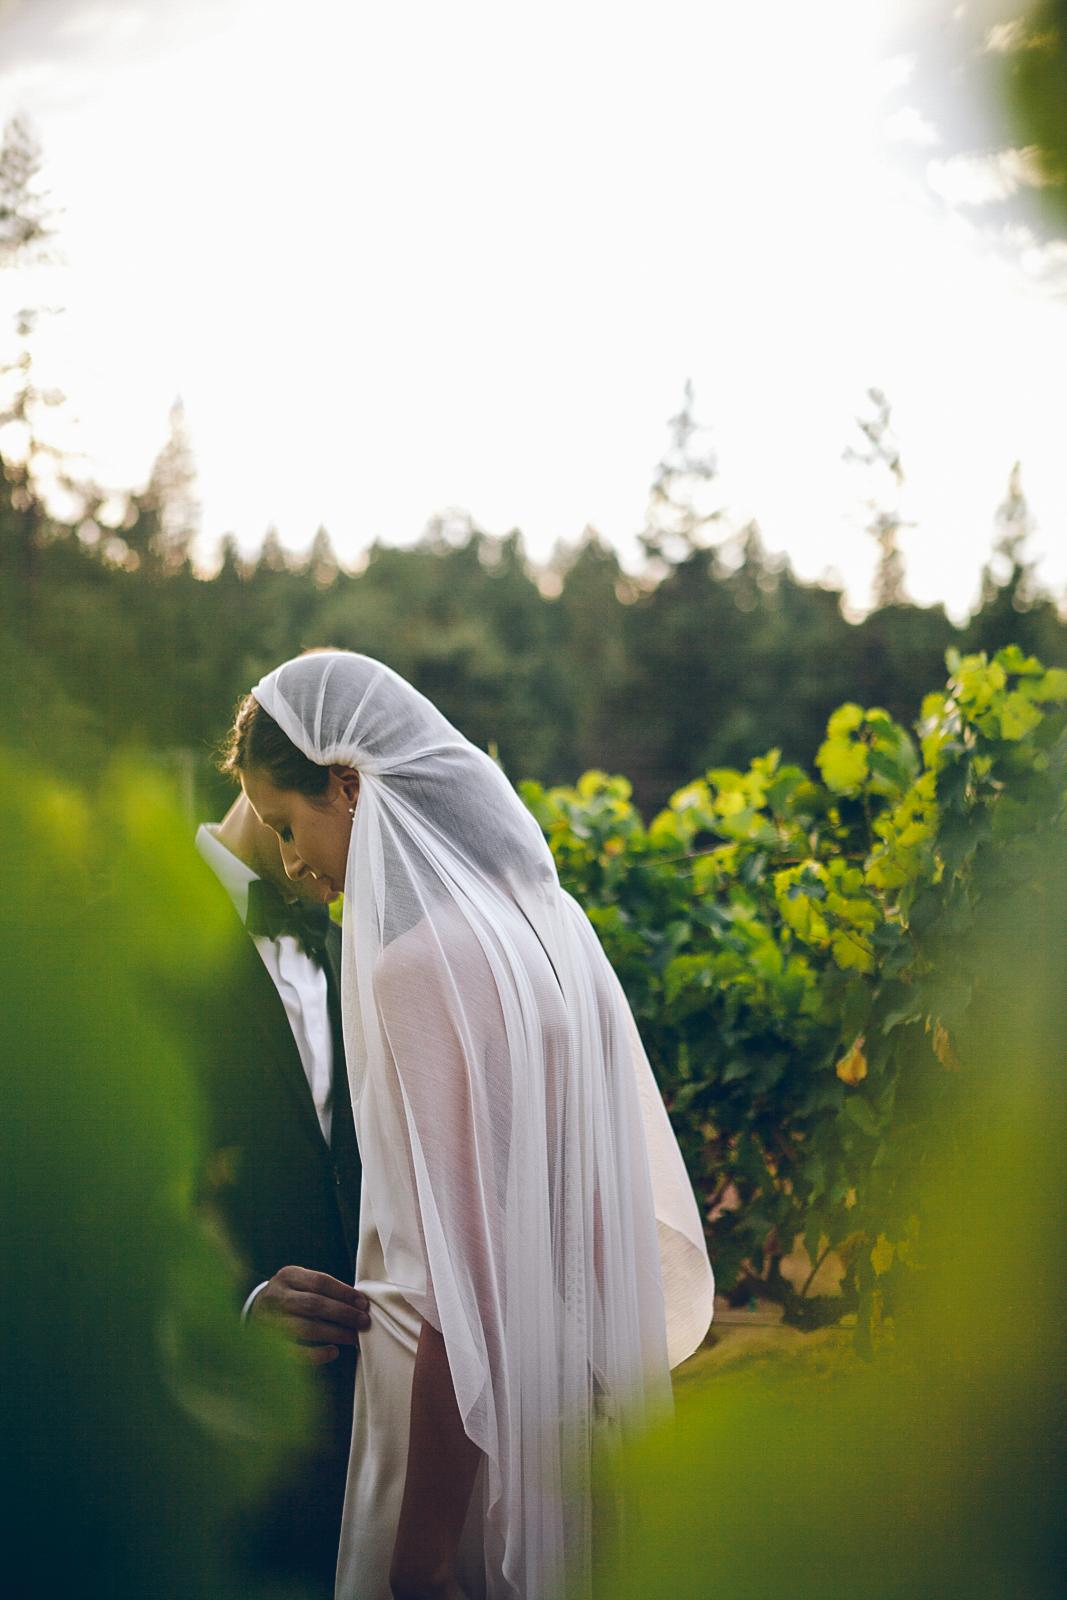 miraflores_winery_wedding_photography_ian_melissa_ebony_siovhan_bokeh_photography_55.jpg